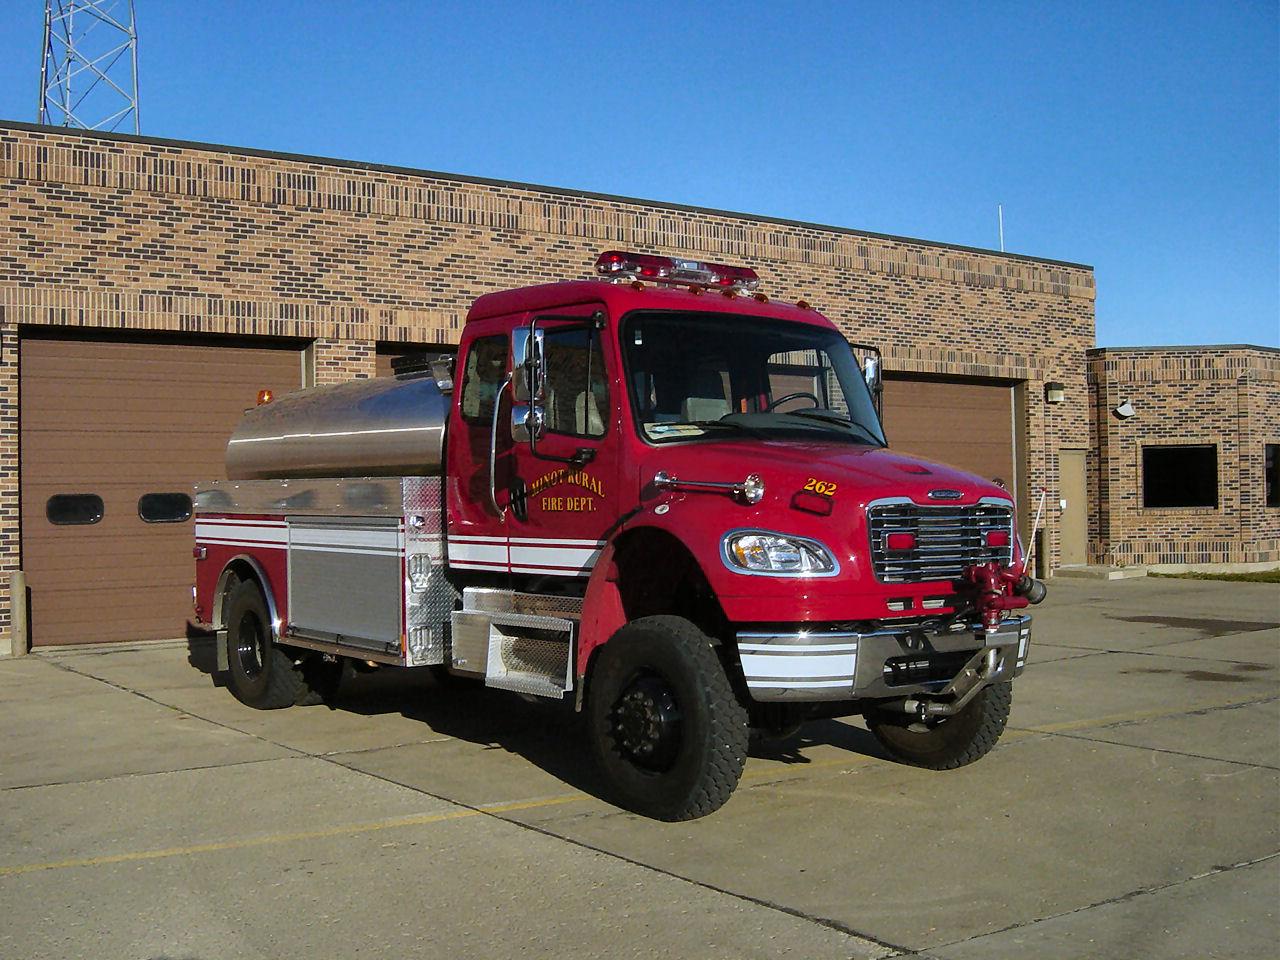 Minot rural fire department apparatus publicscrutiny Images